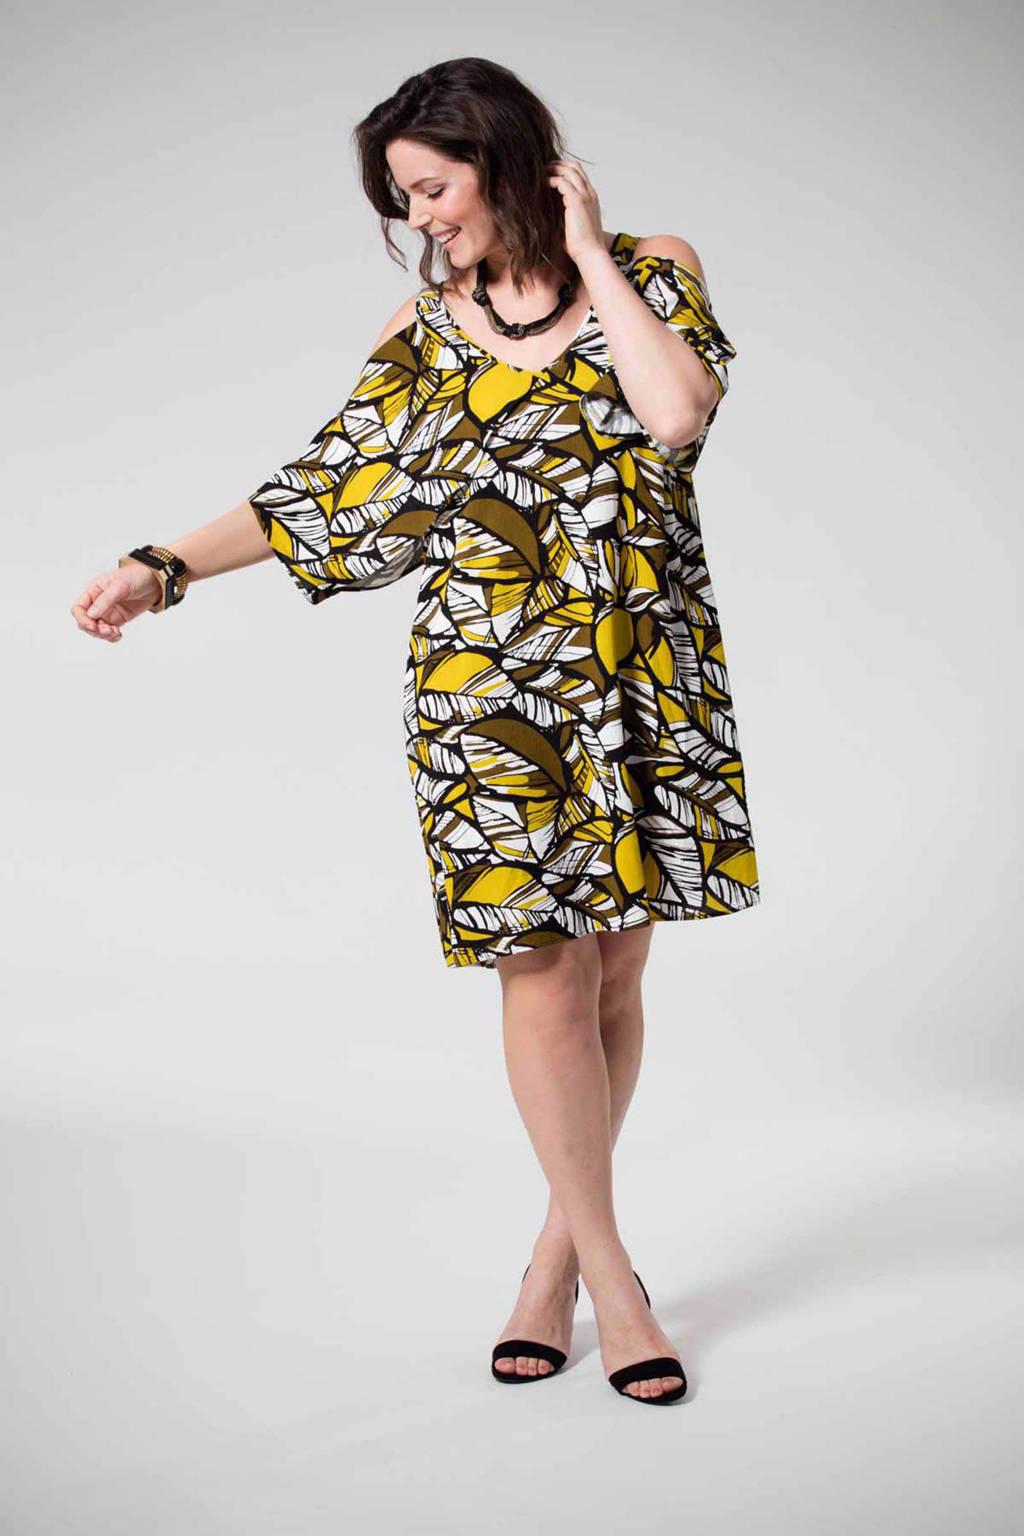 MS Mode jurk, Bruin/wit.mosterdgeel